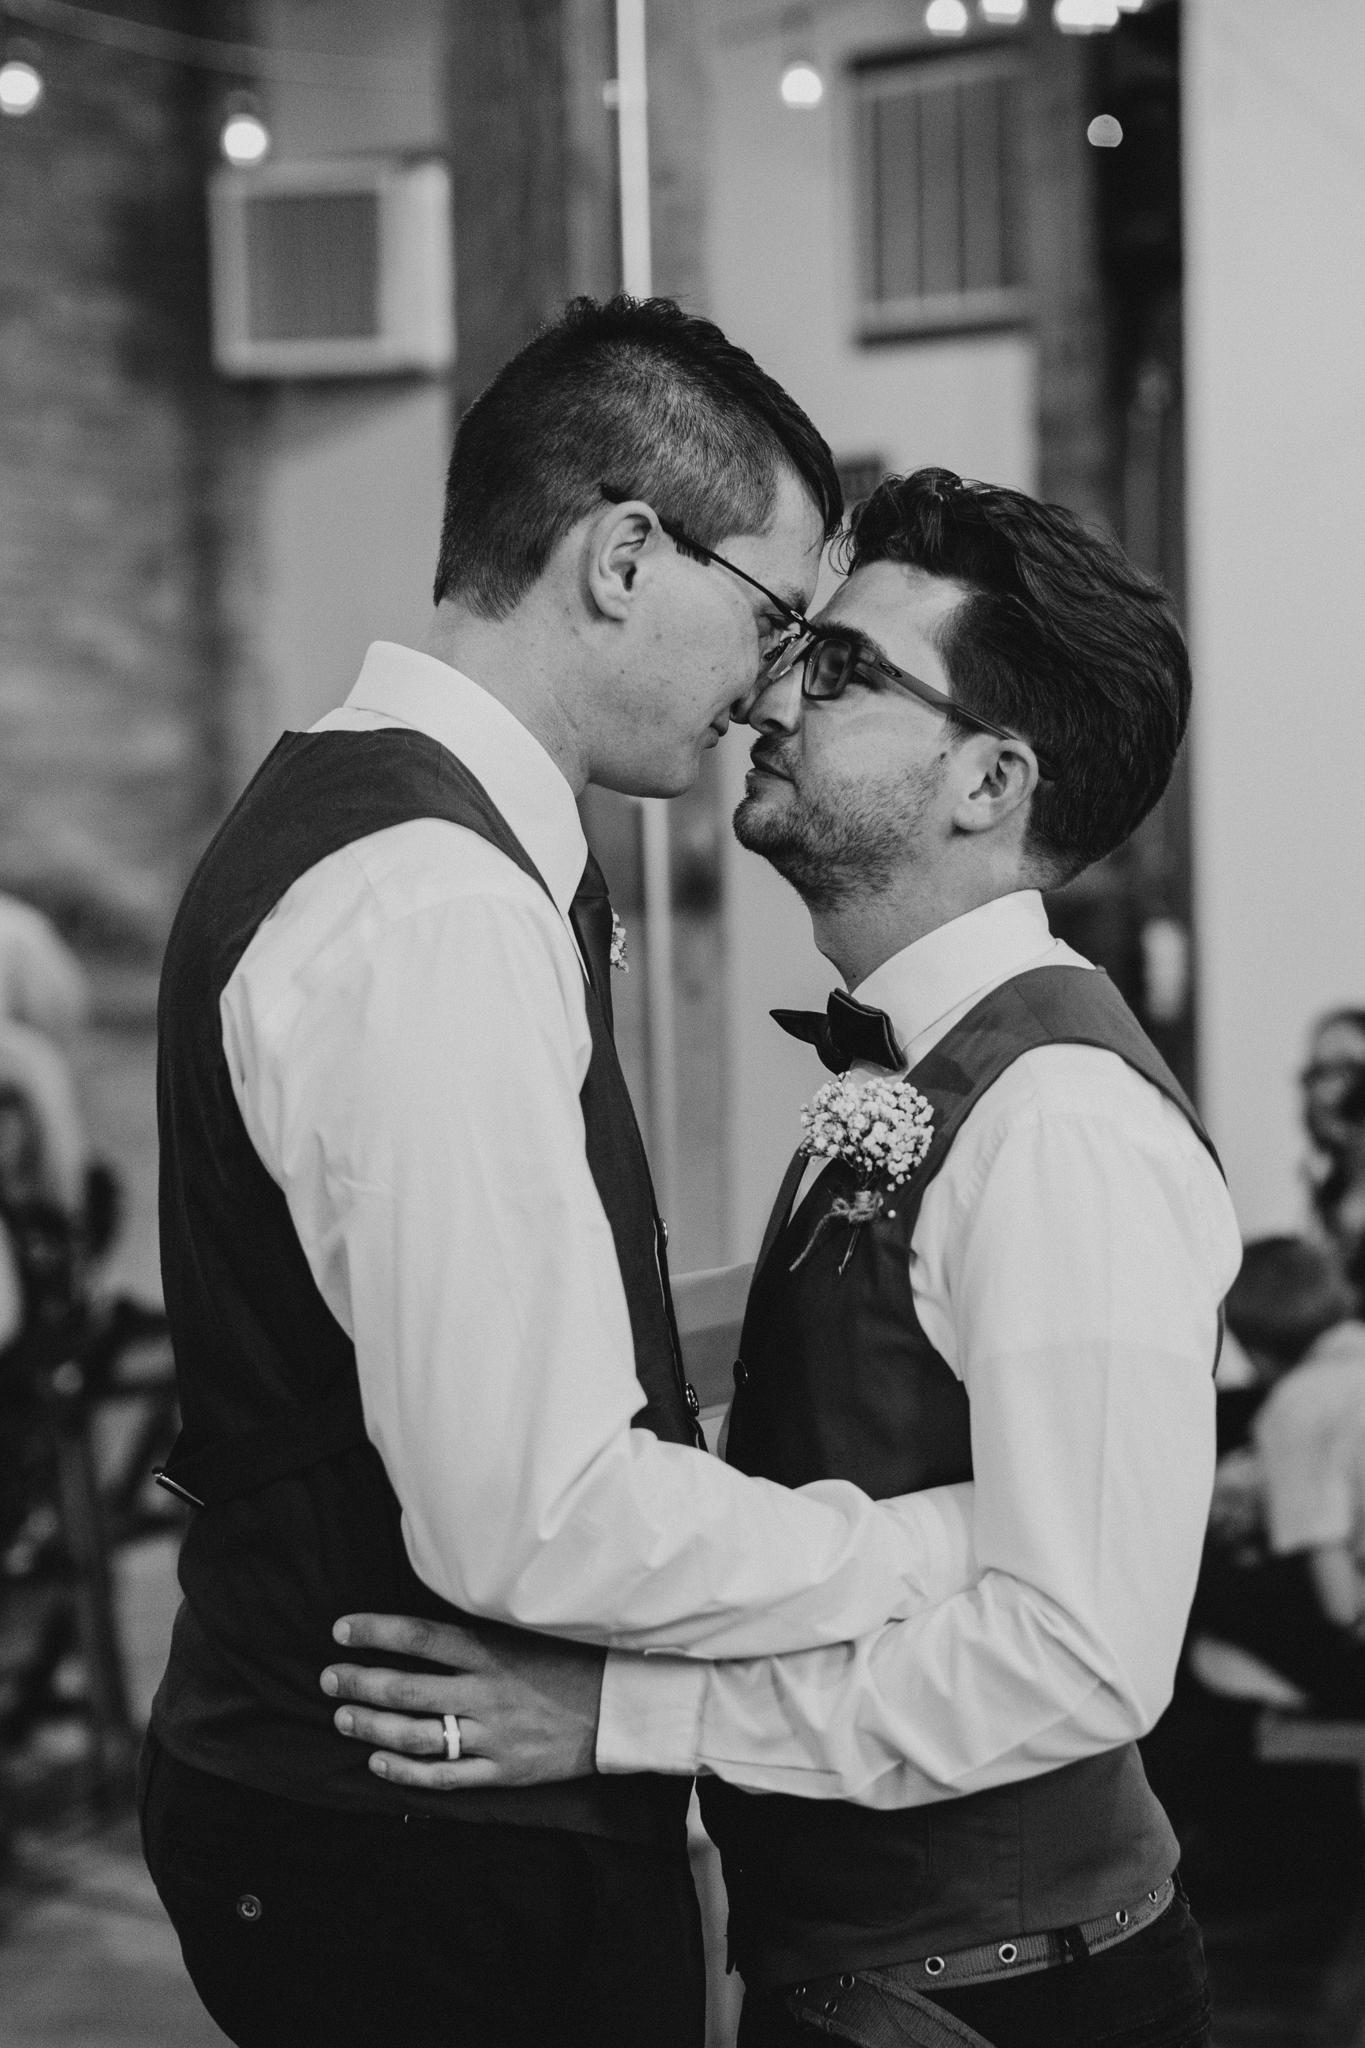 ryan.patrick.wedding-146.jpg